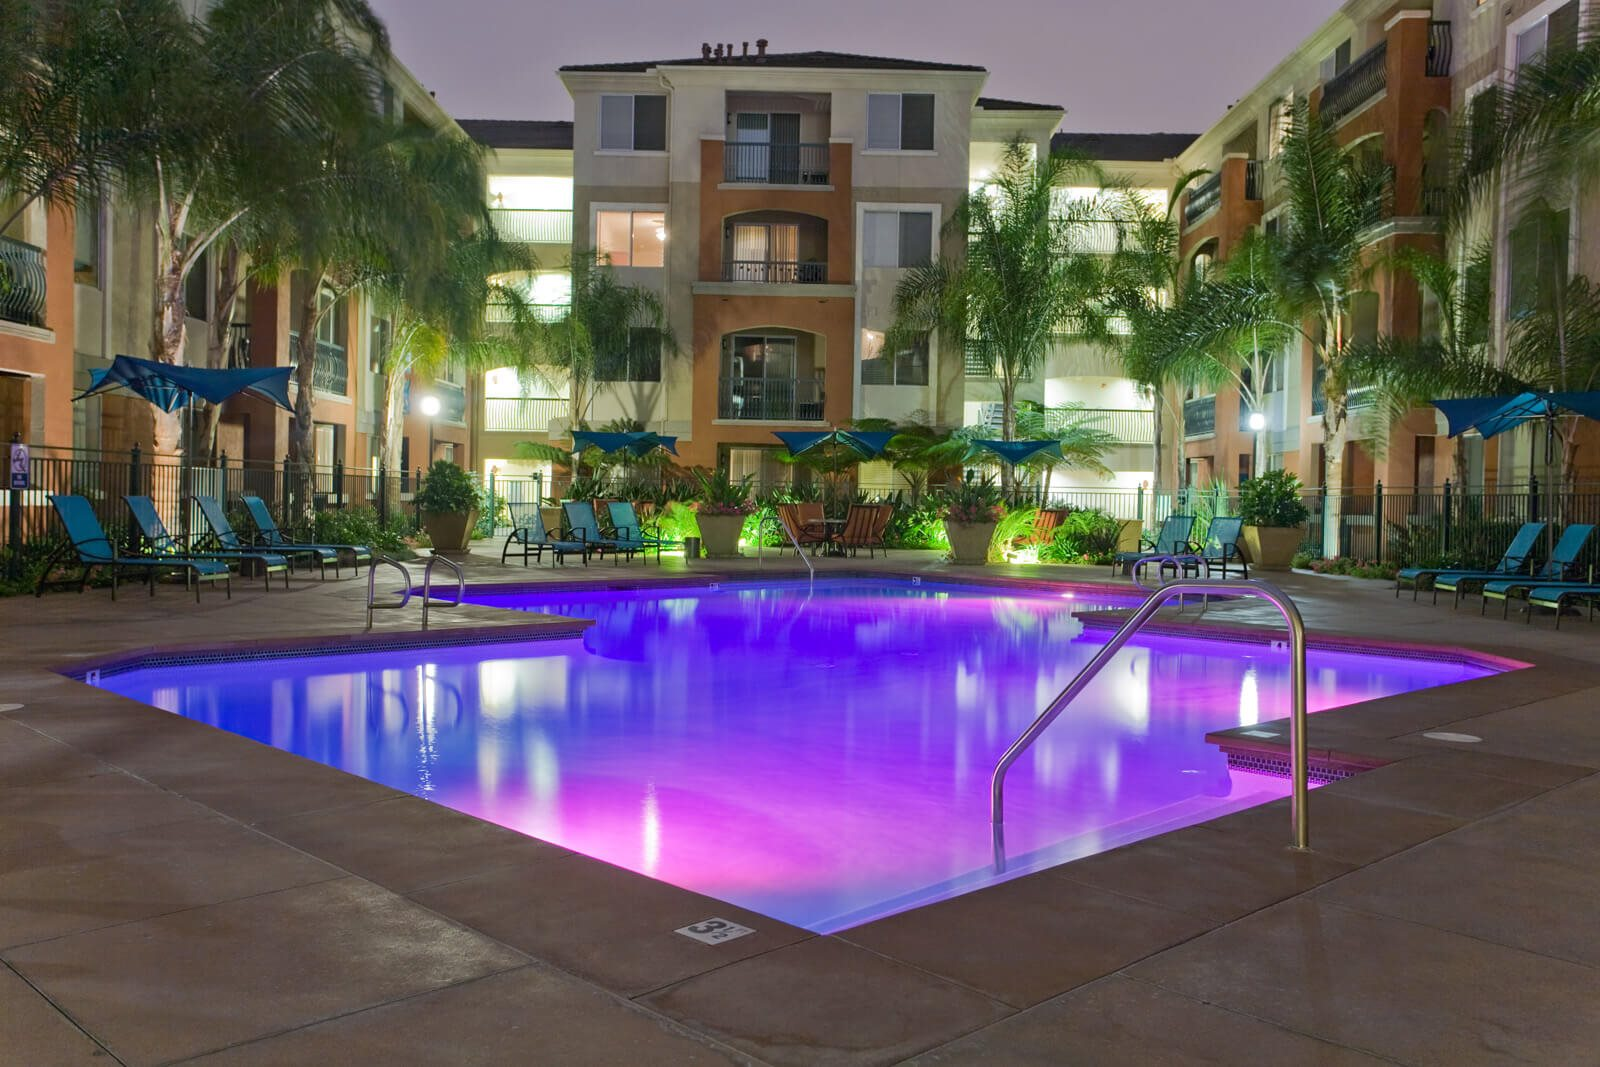 Pool Lighted at Night at Windsor at Main Place, Orange, CA